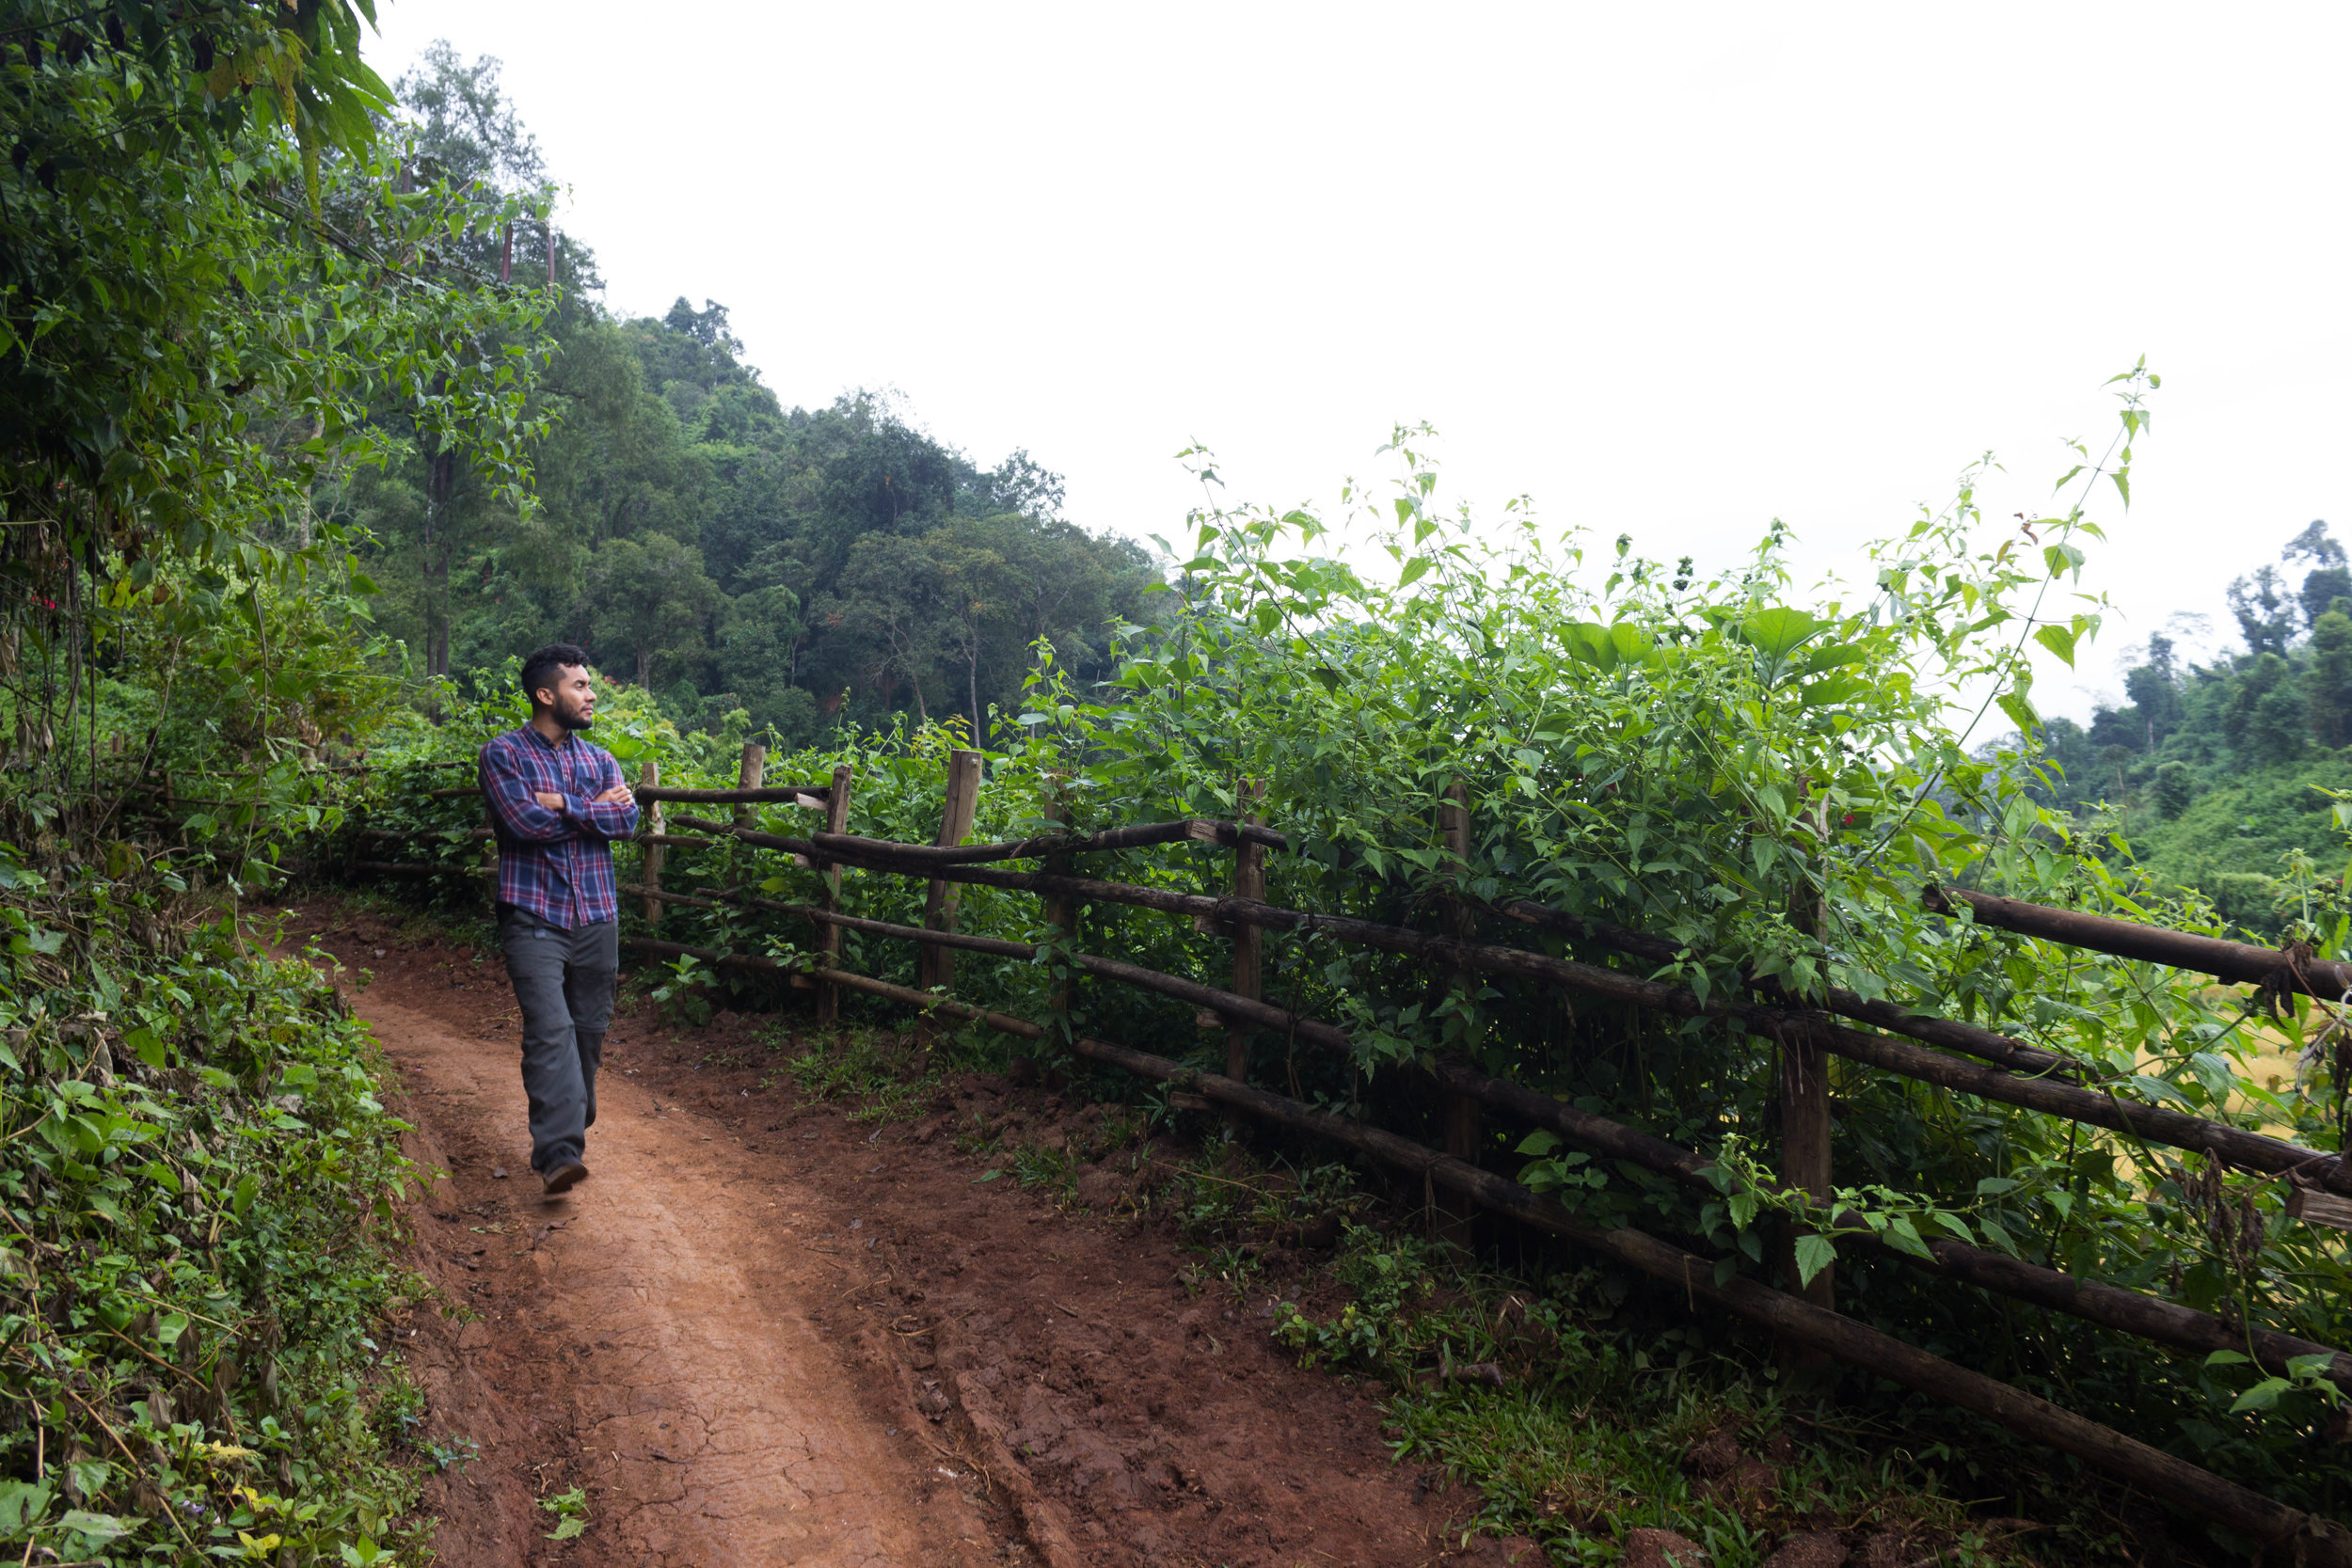 Walking along the red dirt road of the Karen village